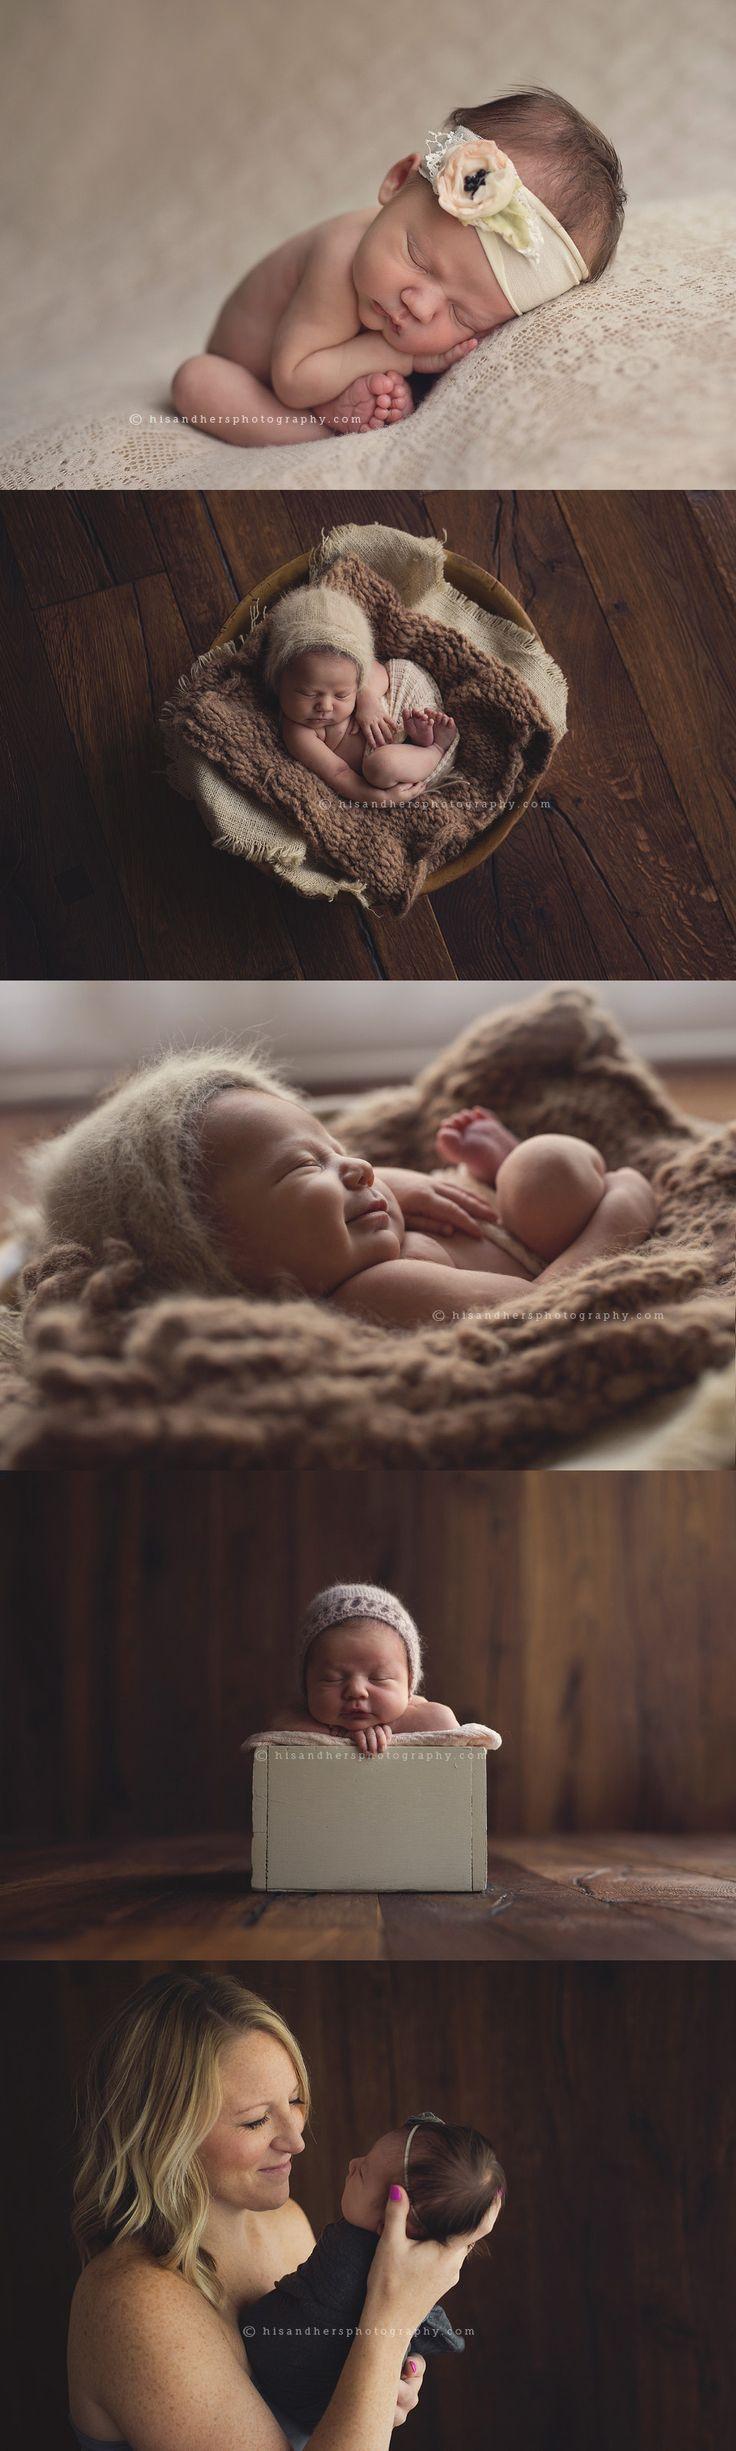 5-day-old Ruby Kate | Des Moines, Iowa newborn photographer, Darcy Milder | His…